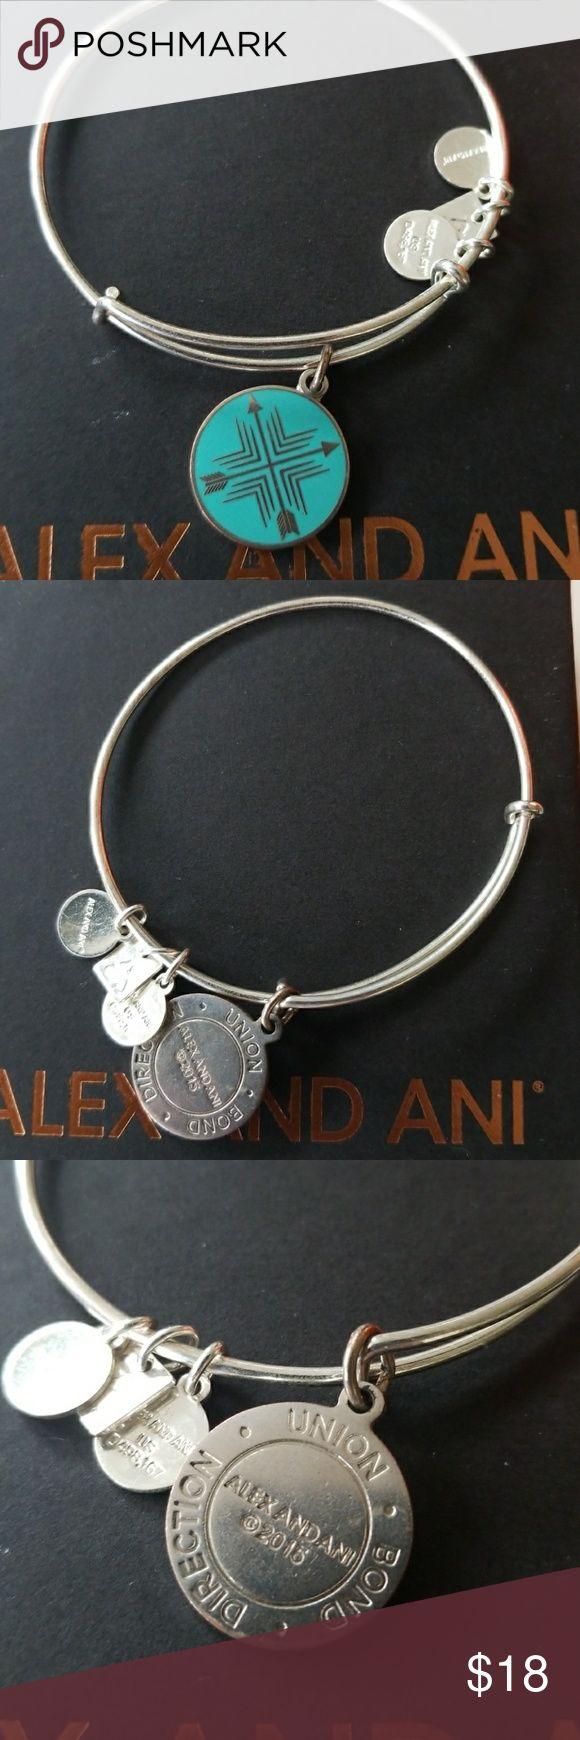 Arrows of friendship ALEX AND ANI bracelet silver some scratches from wear on bracelet and charms Alex & Ani Jewelry Bracelets